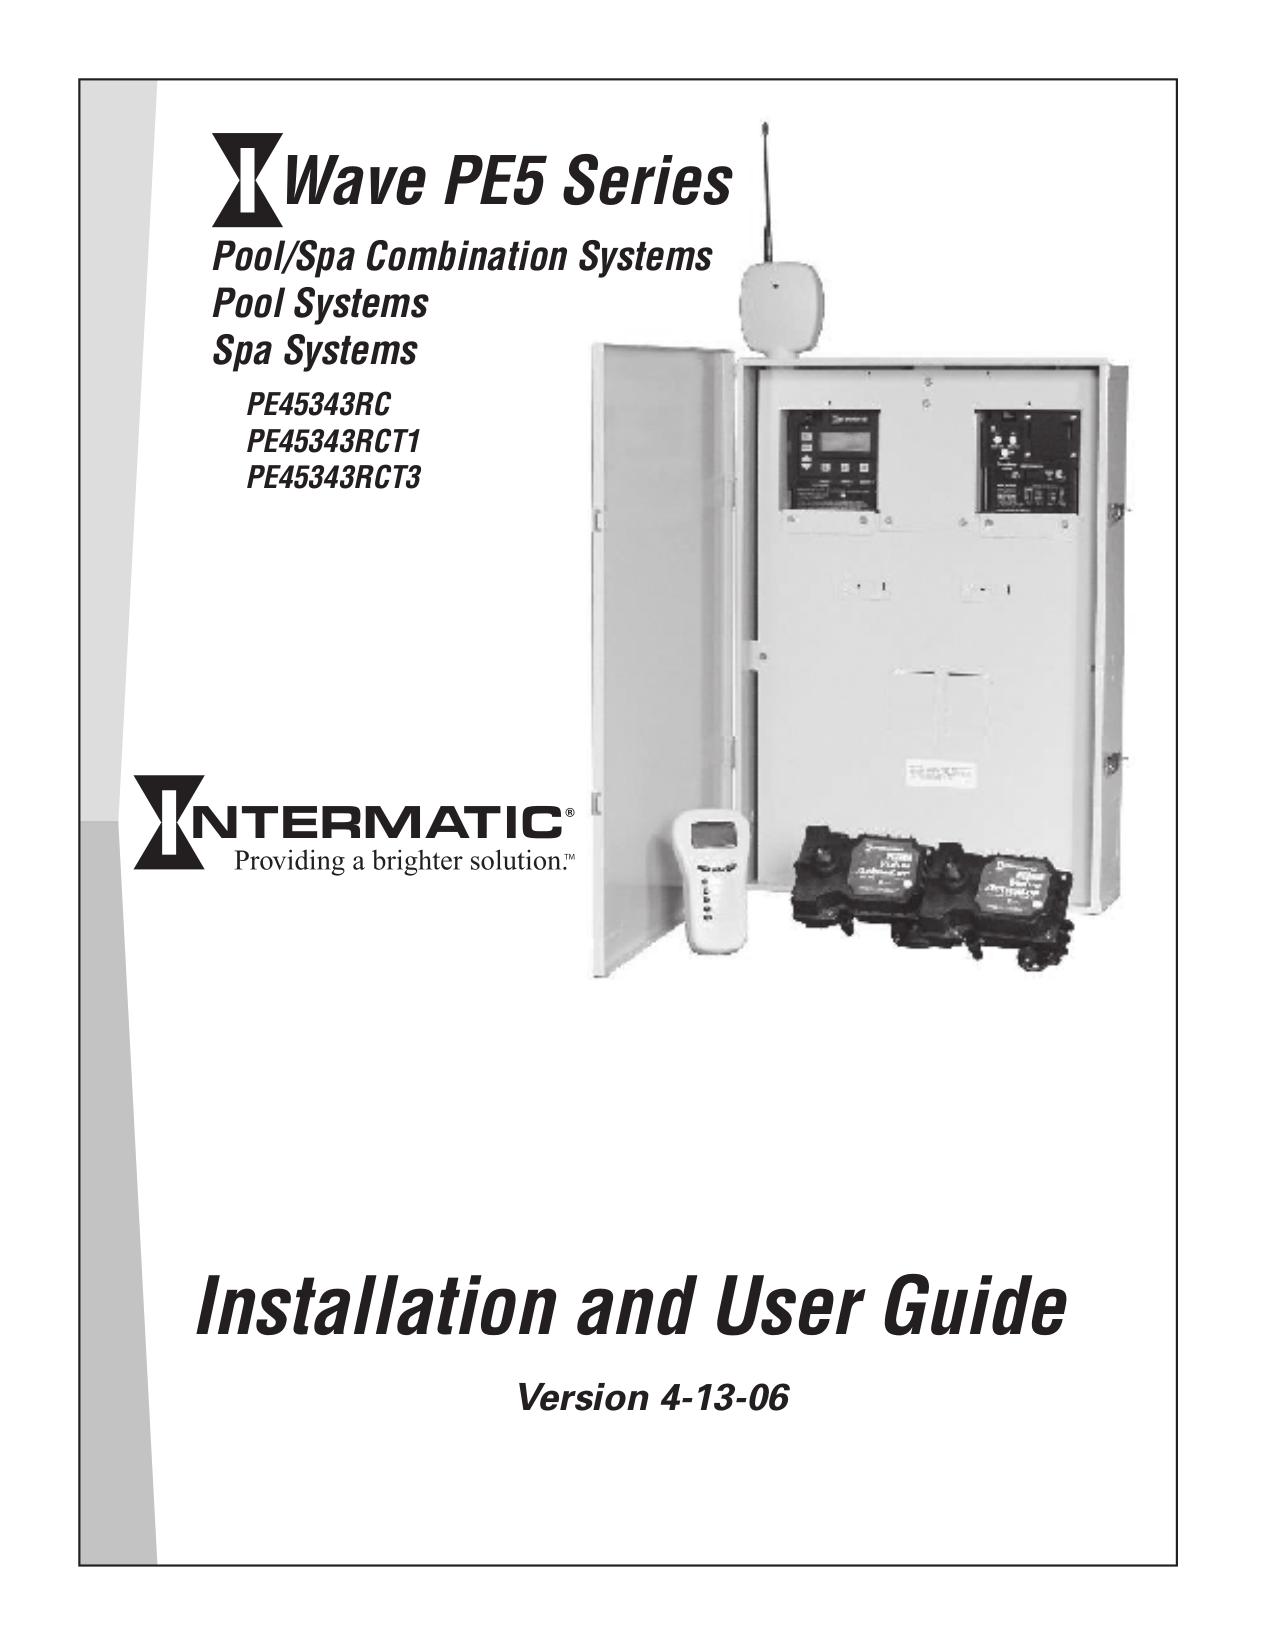 intermatic p1353me wiring diagram 33 wiring diagram ... intermatic wh40 wiring diagram